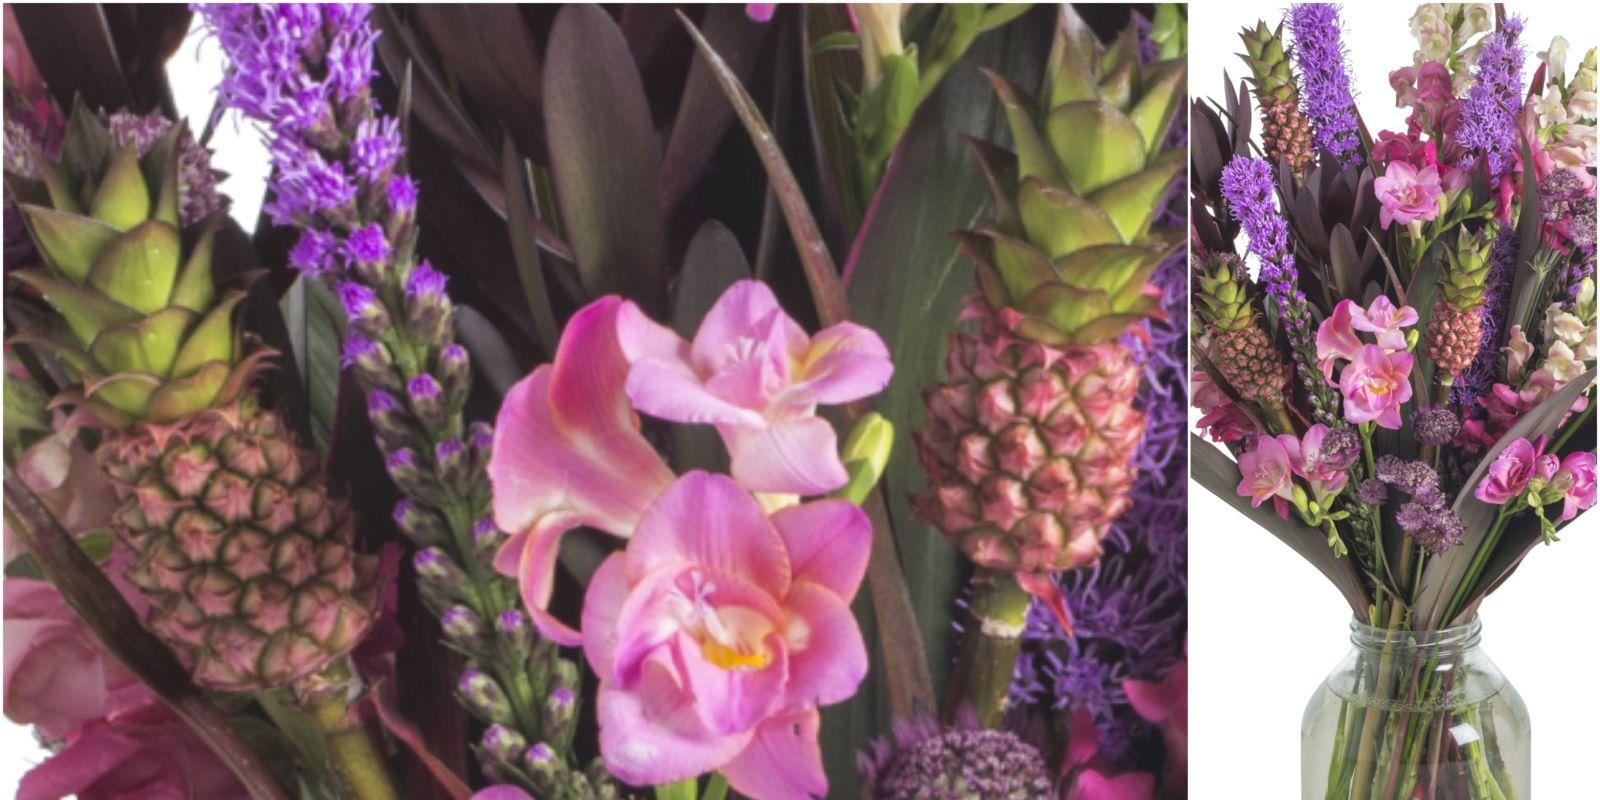 bloom wild is selling mini pineapple flower bouquets